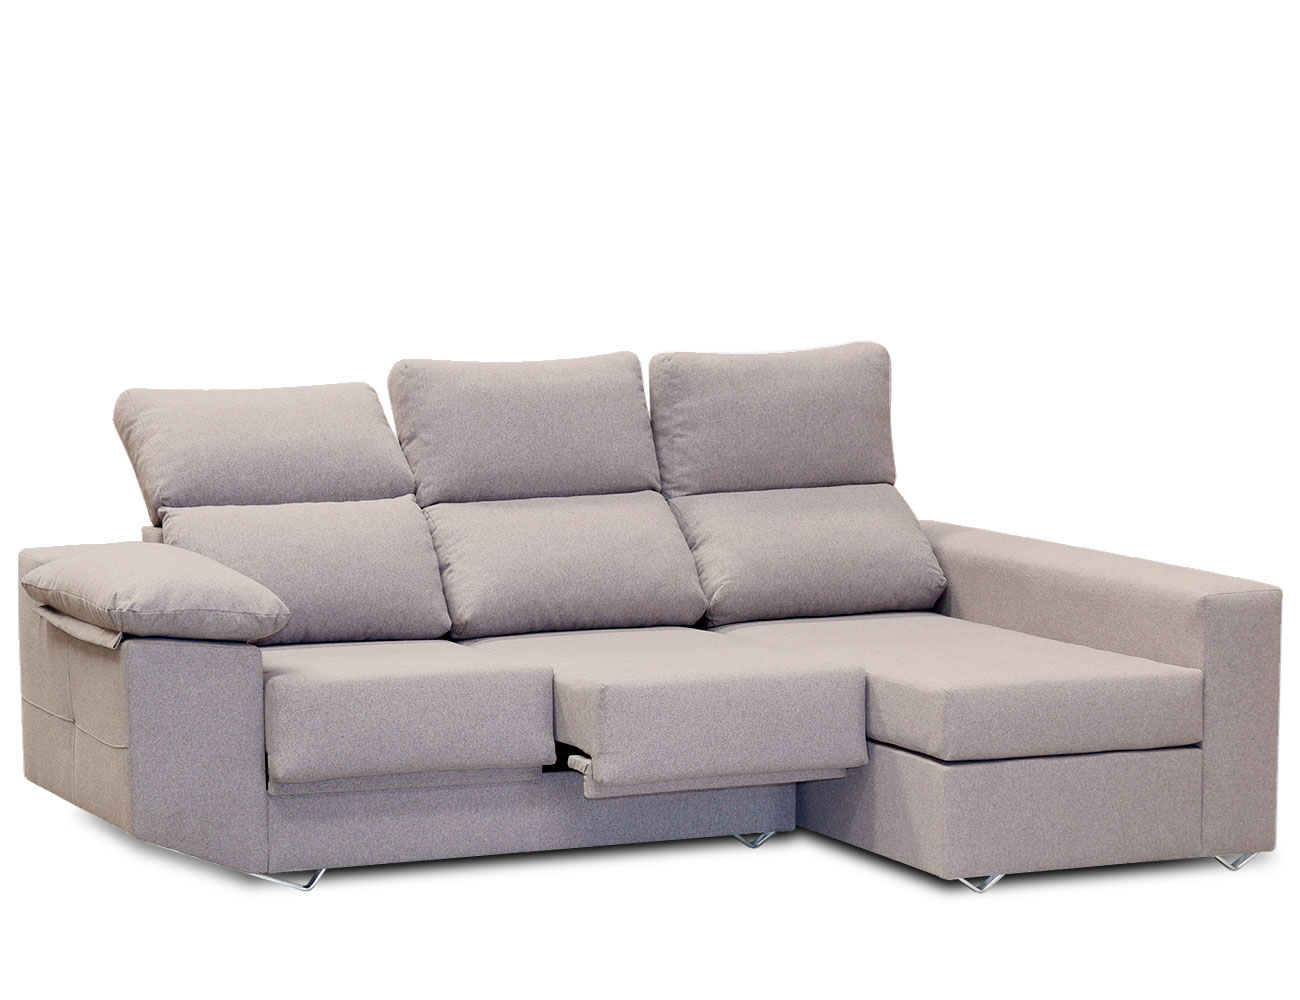 Sofa chaiselongue moderno piedra 3